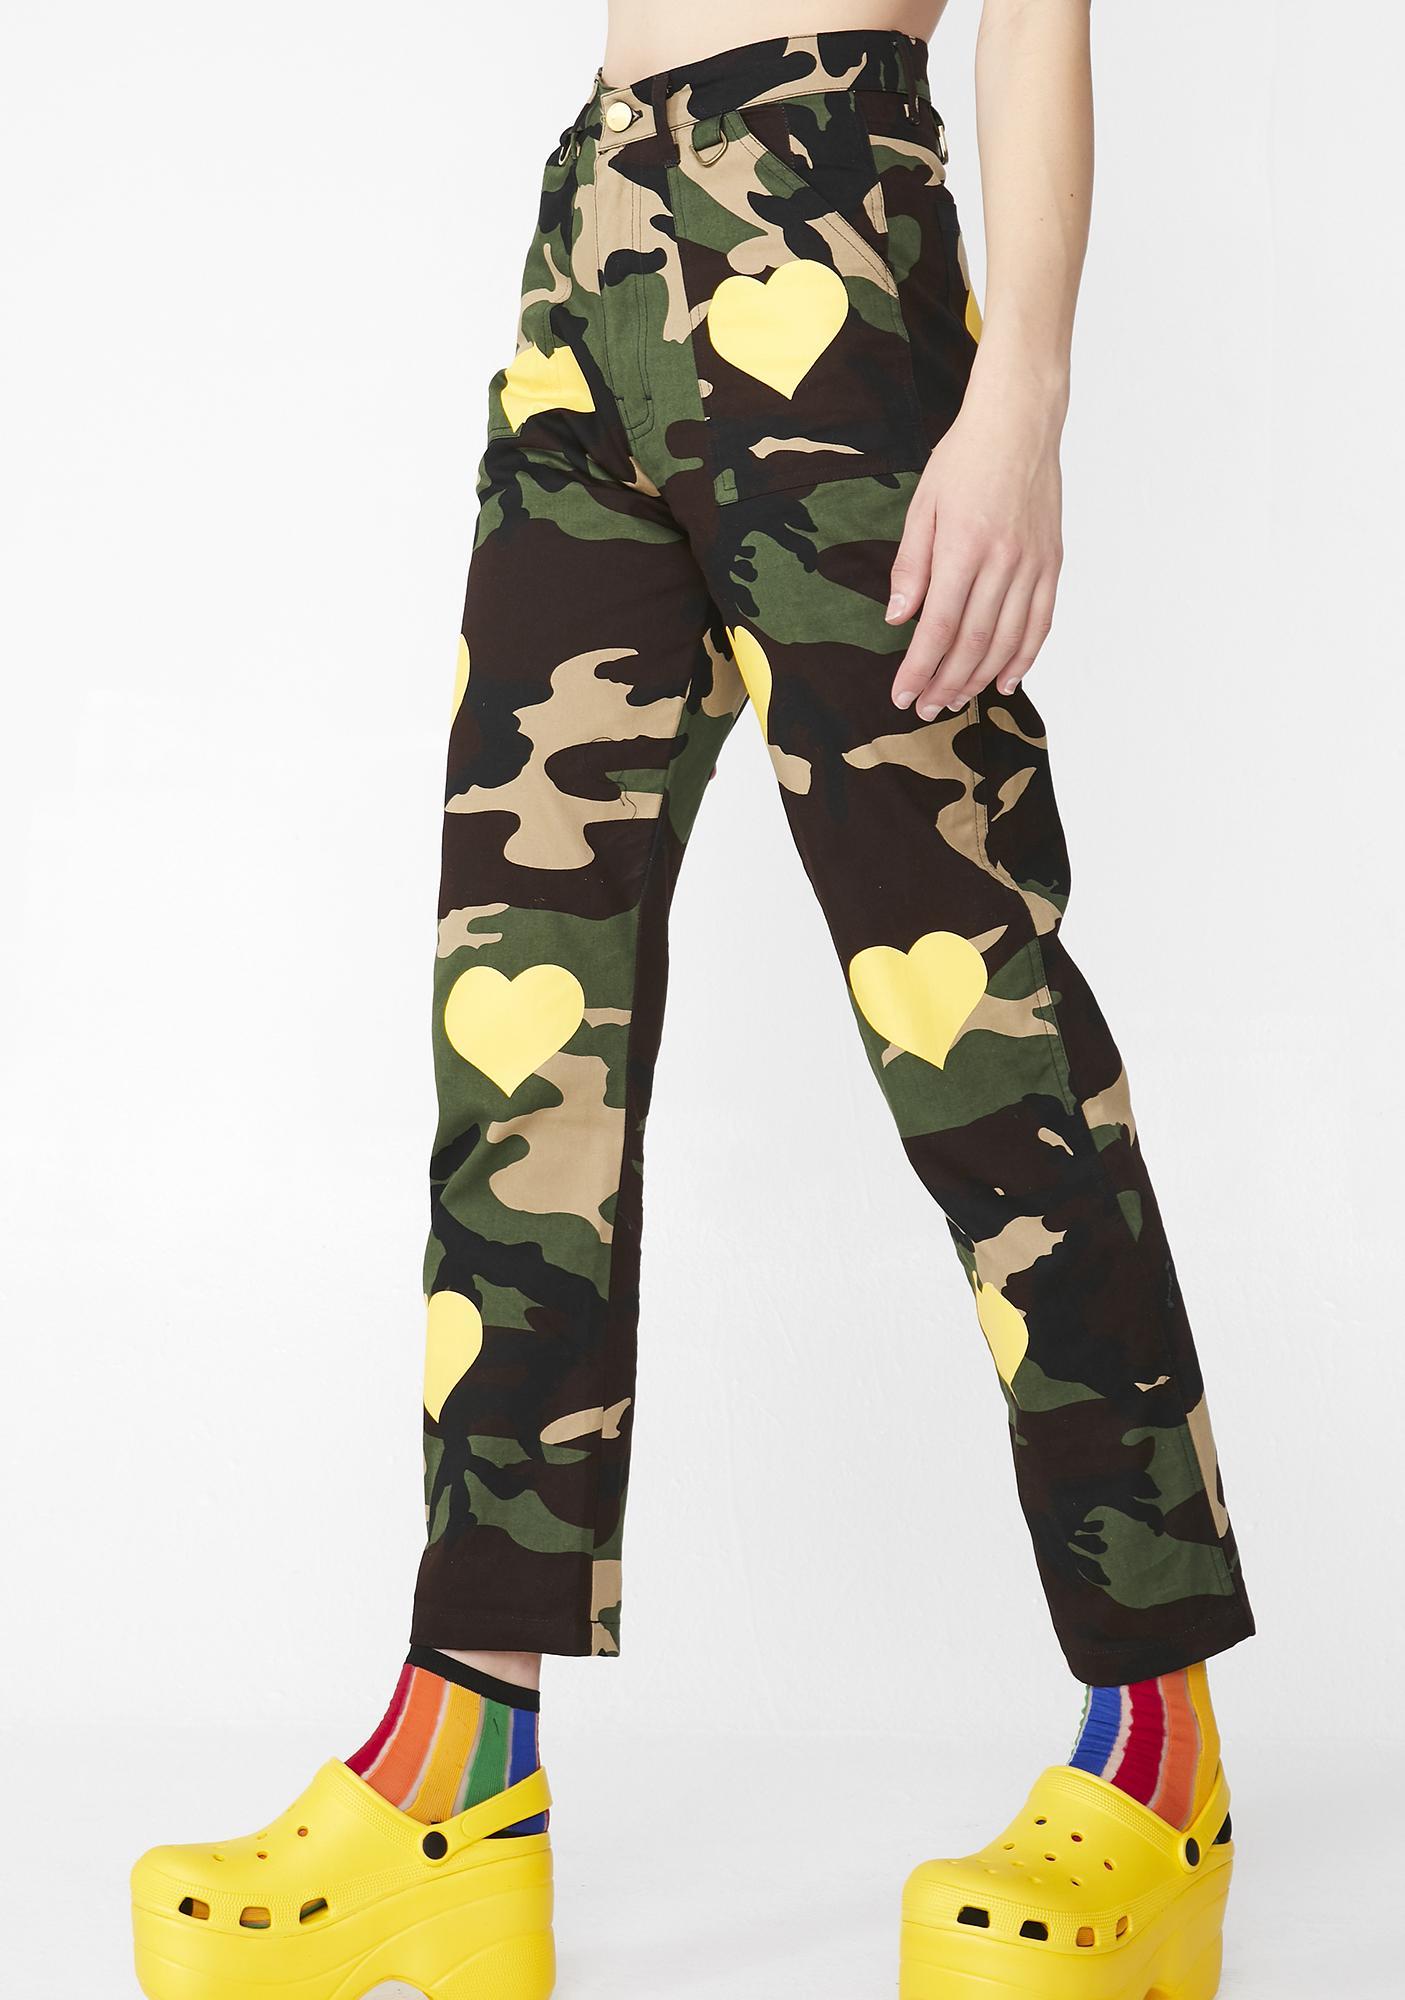 Cute Mistake Tough Love Pants